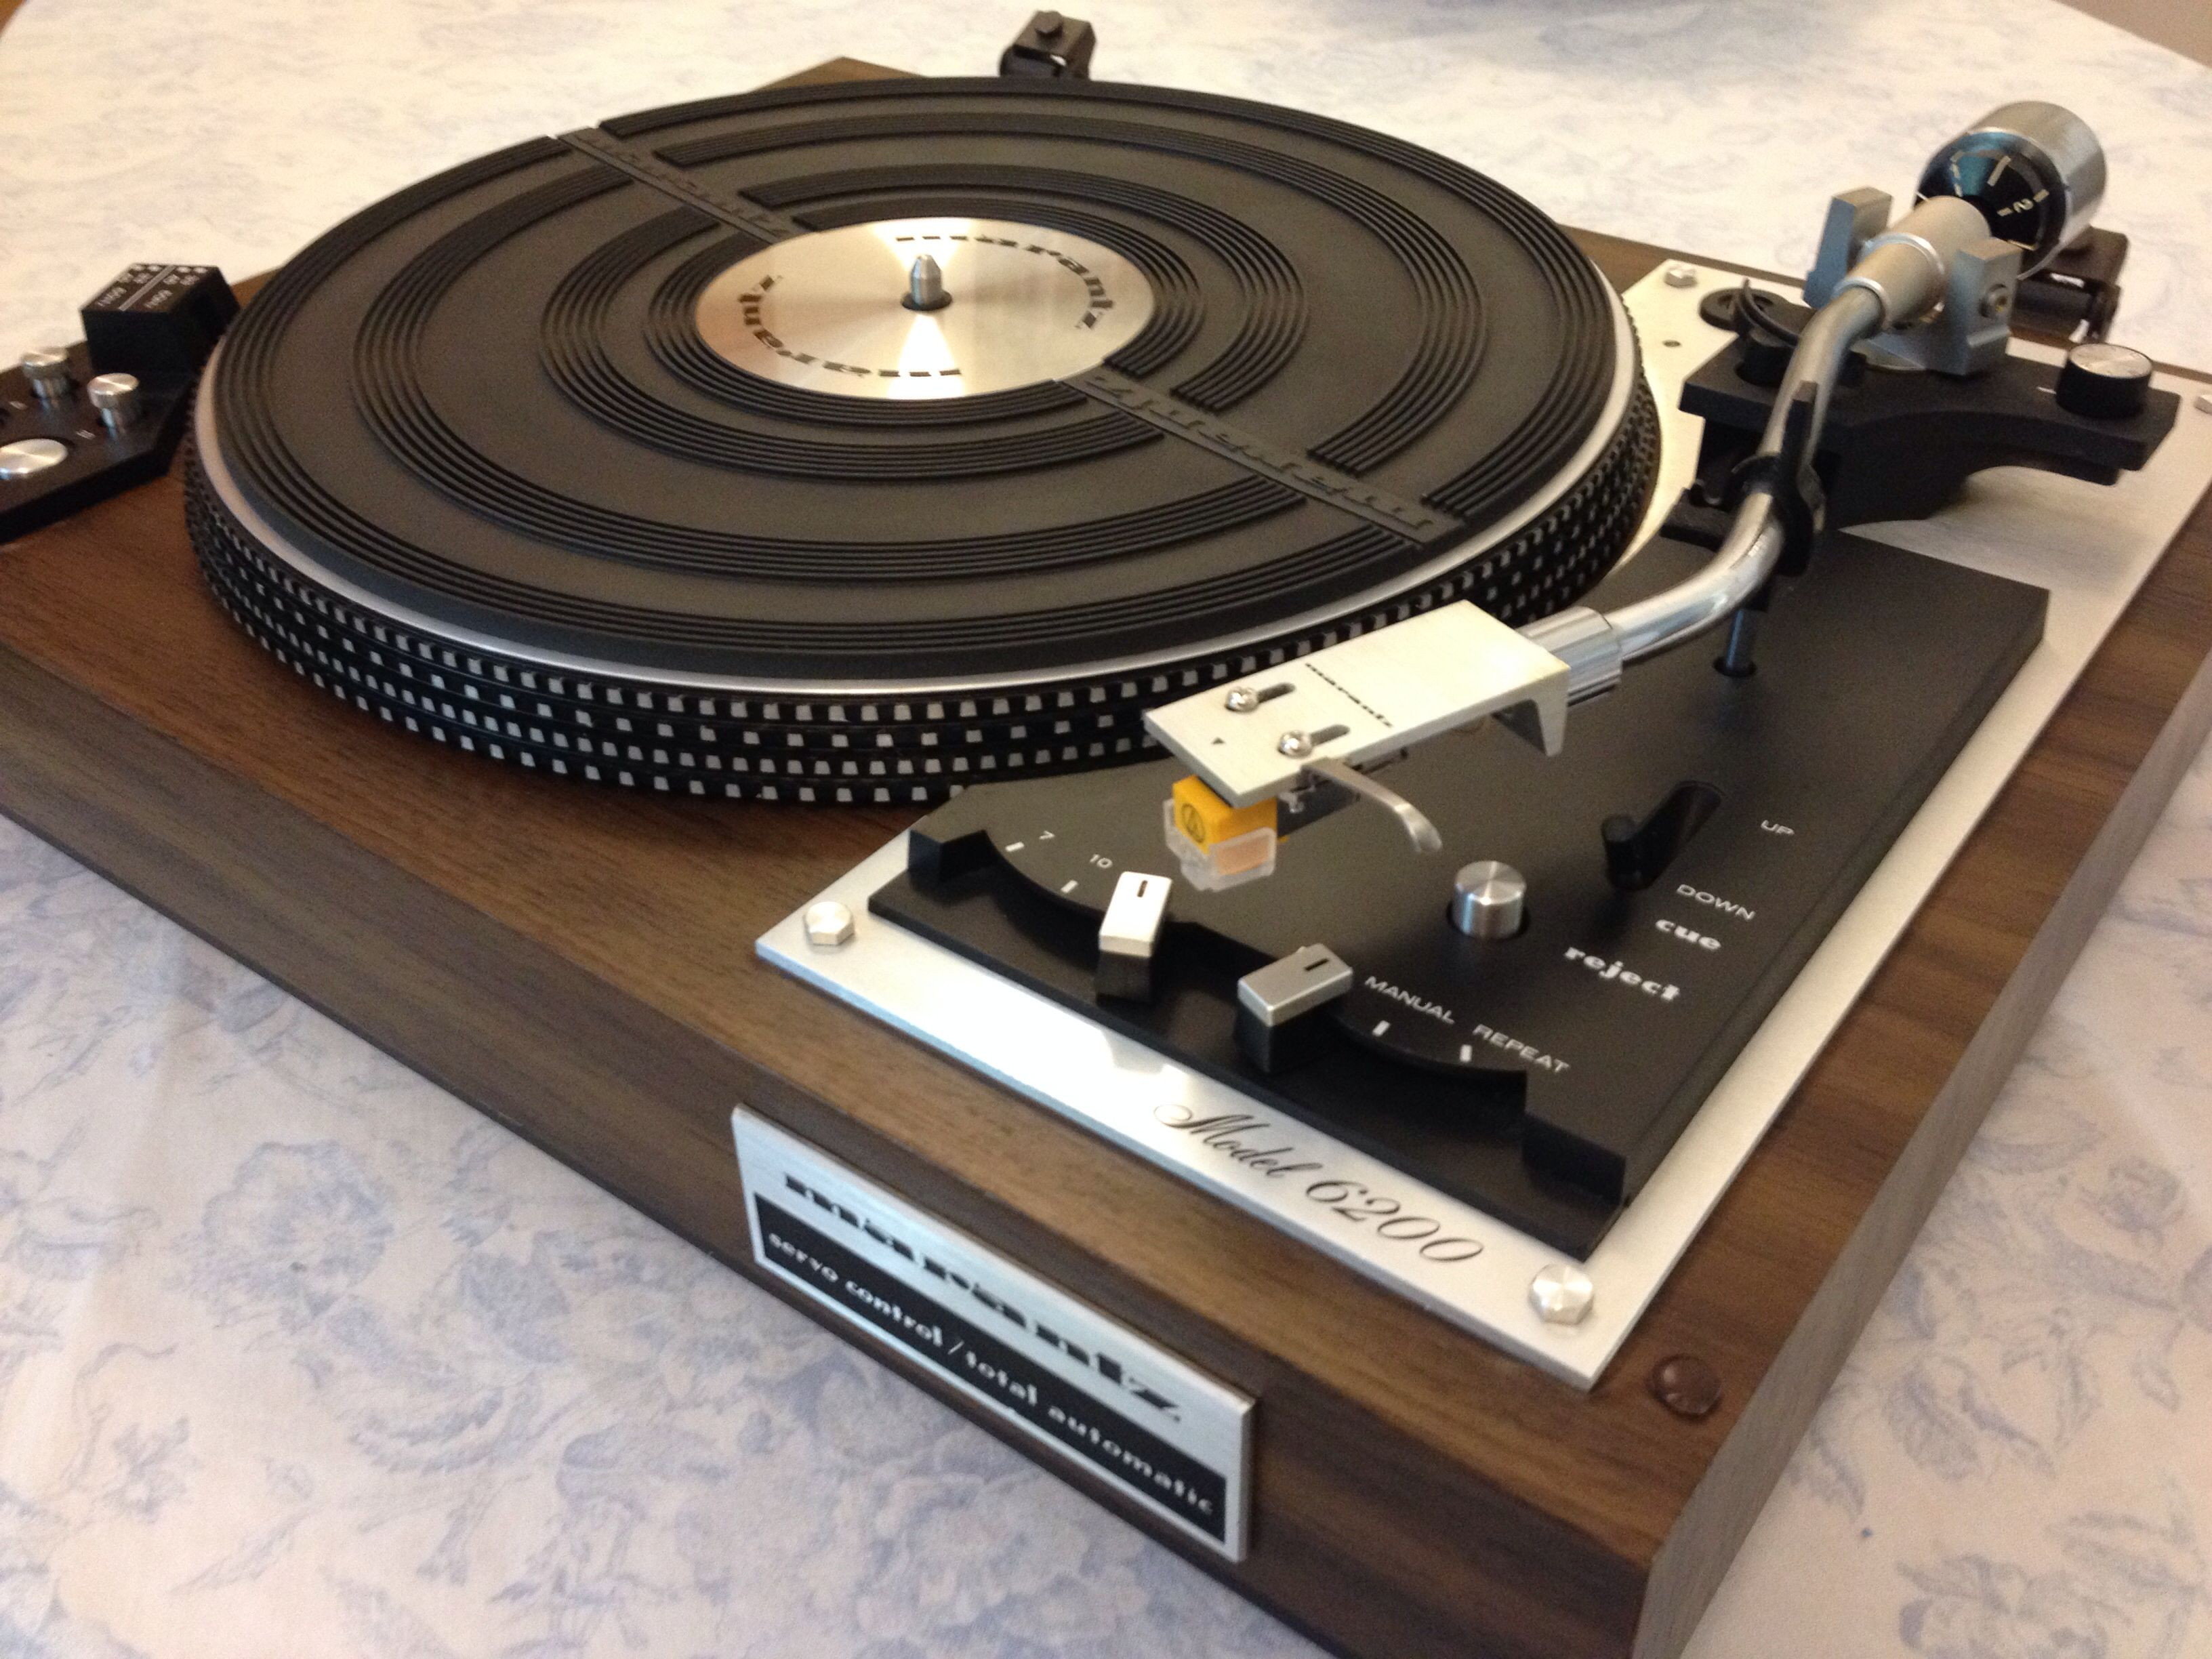 Marantz 6200 Turntable Record Player Turntable Record Player Record Players Vintage Electronics